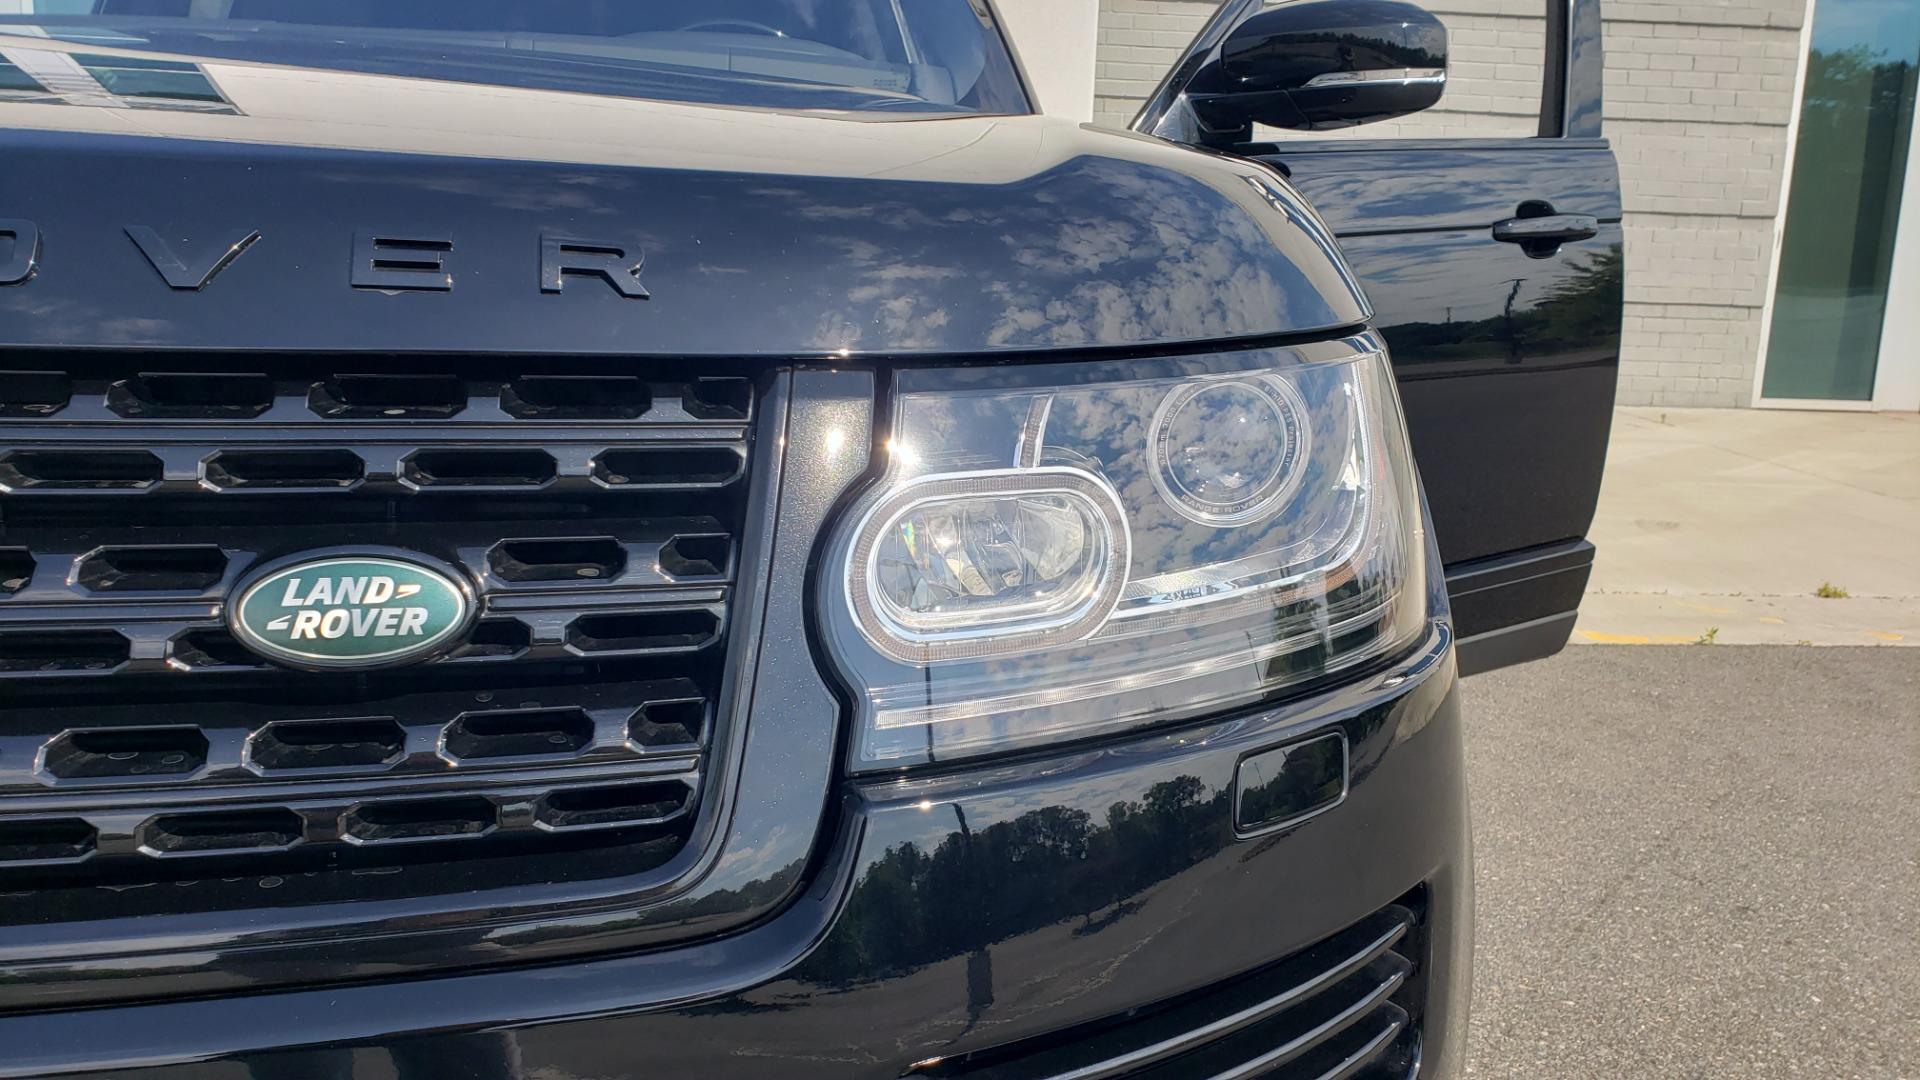 Used 2017 Land Rover RANGE ROVER SC V8 / VISION ASST / DRIVE PKG / MERIDIAN SOUND / PANO-ROOF / NAV / BSM for sale $75,995 at Formula Imports in Charlotte NC 28227 27